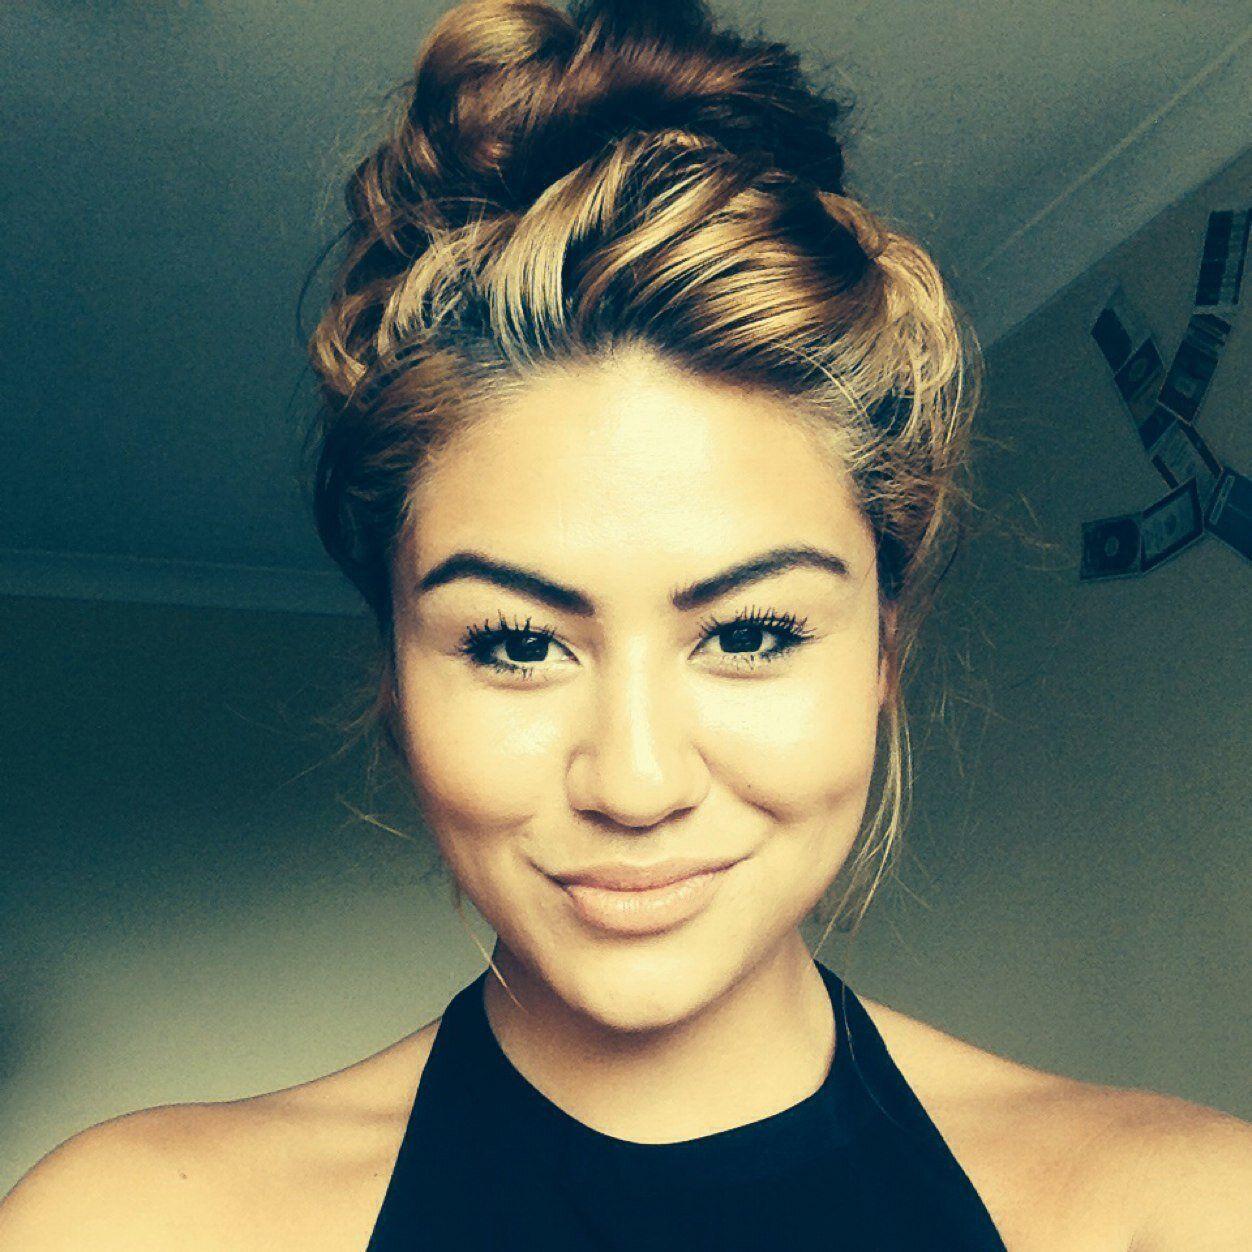 Mali-Koa Hood can we take a second and appreciate how pretty Calum's sister is | 5sos ...